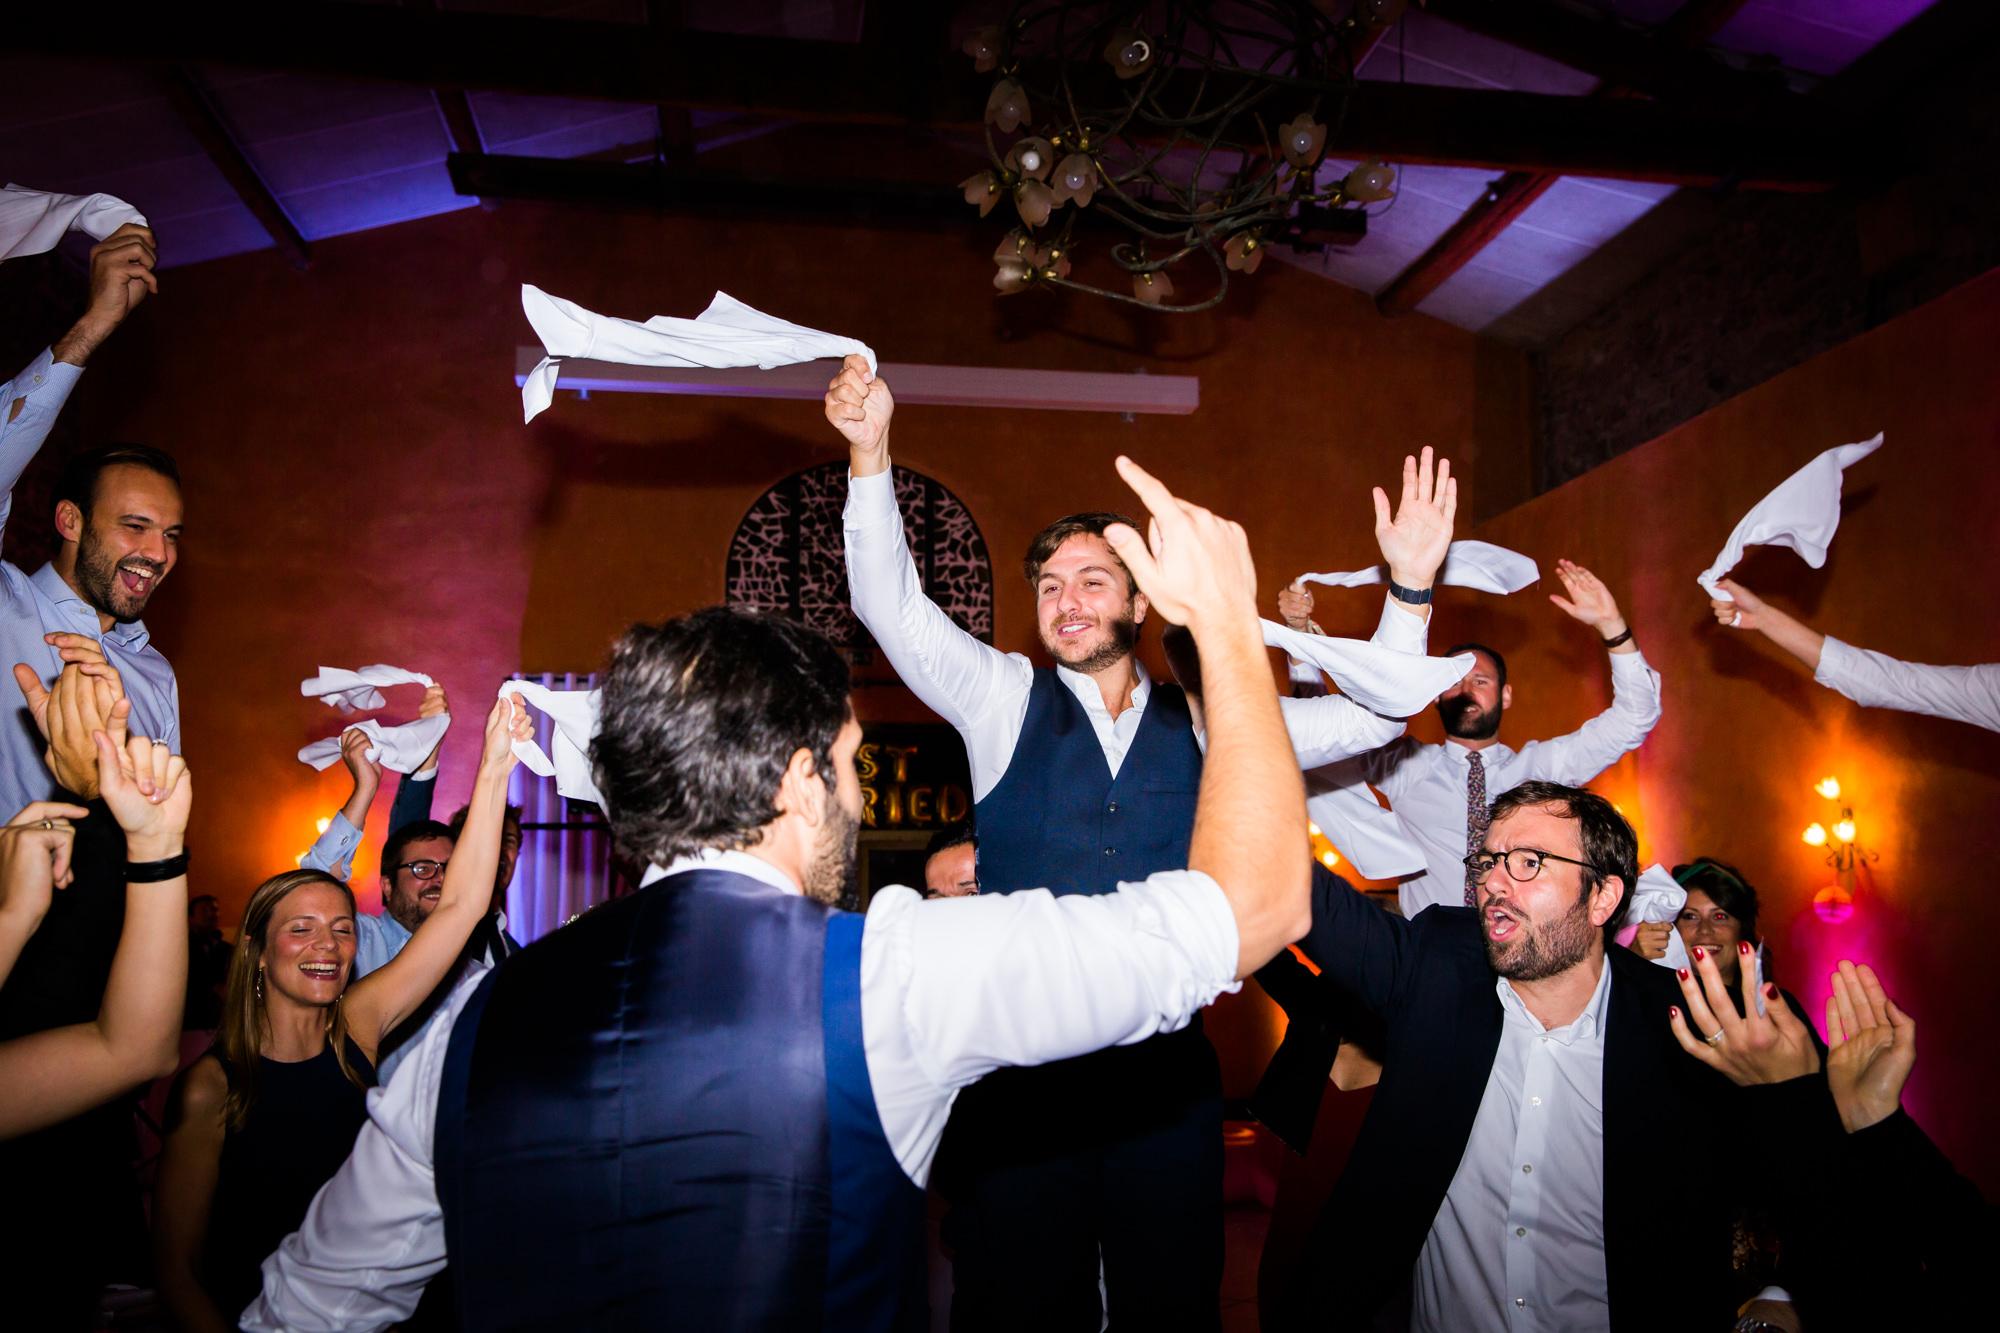 wedding party - flash - canon - mariage